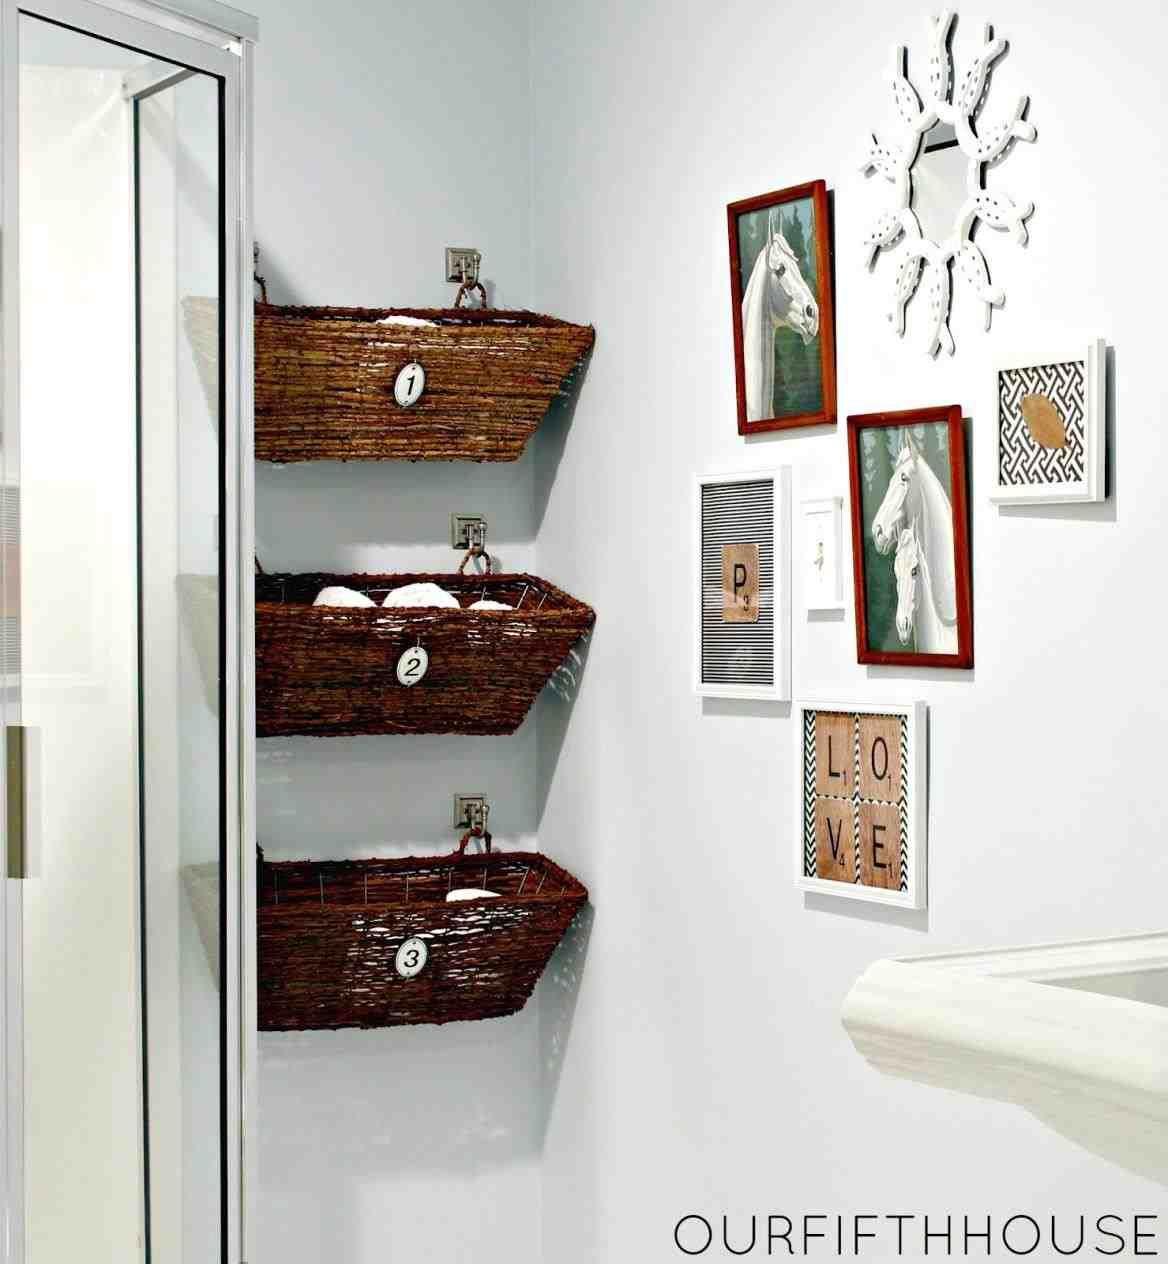 51 Amazing Small Bathroom Storage Ideas For 2018 Best regarding sizing 1168 X 1264